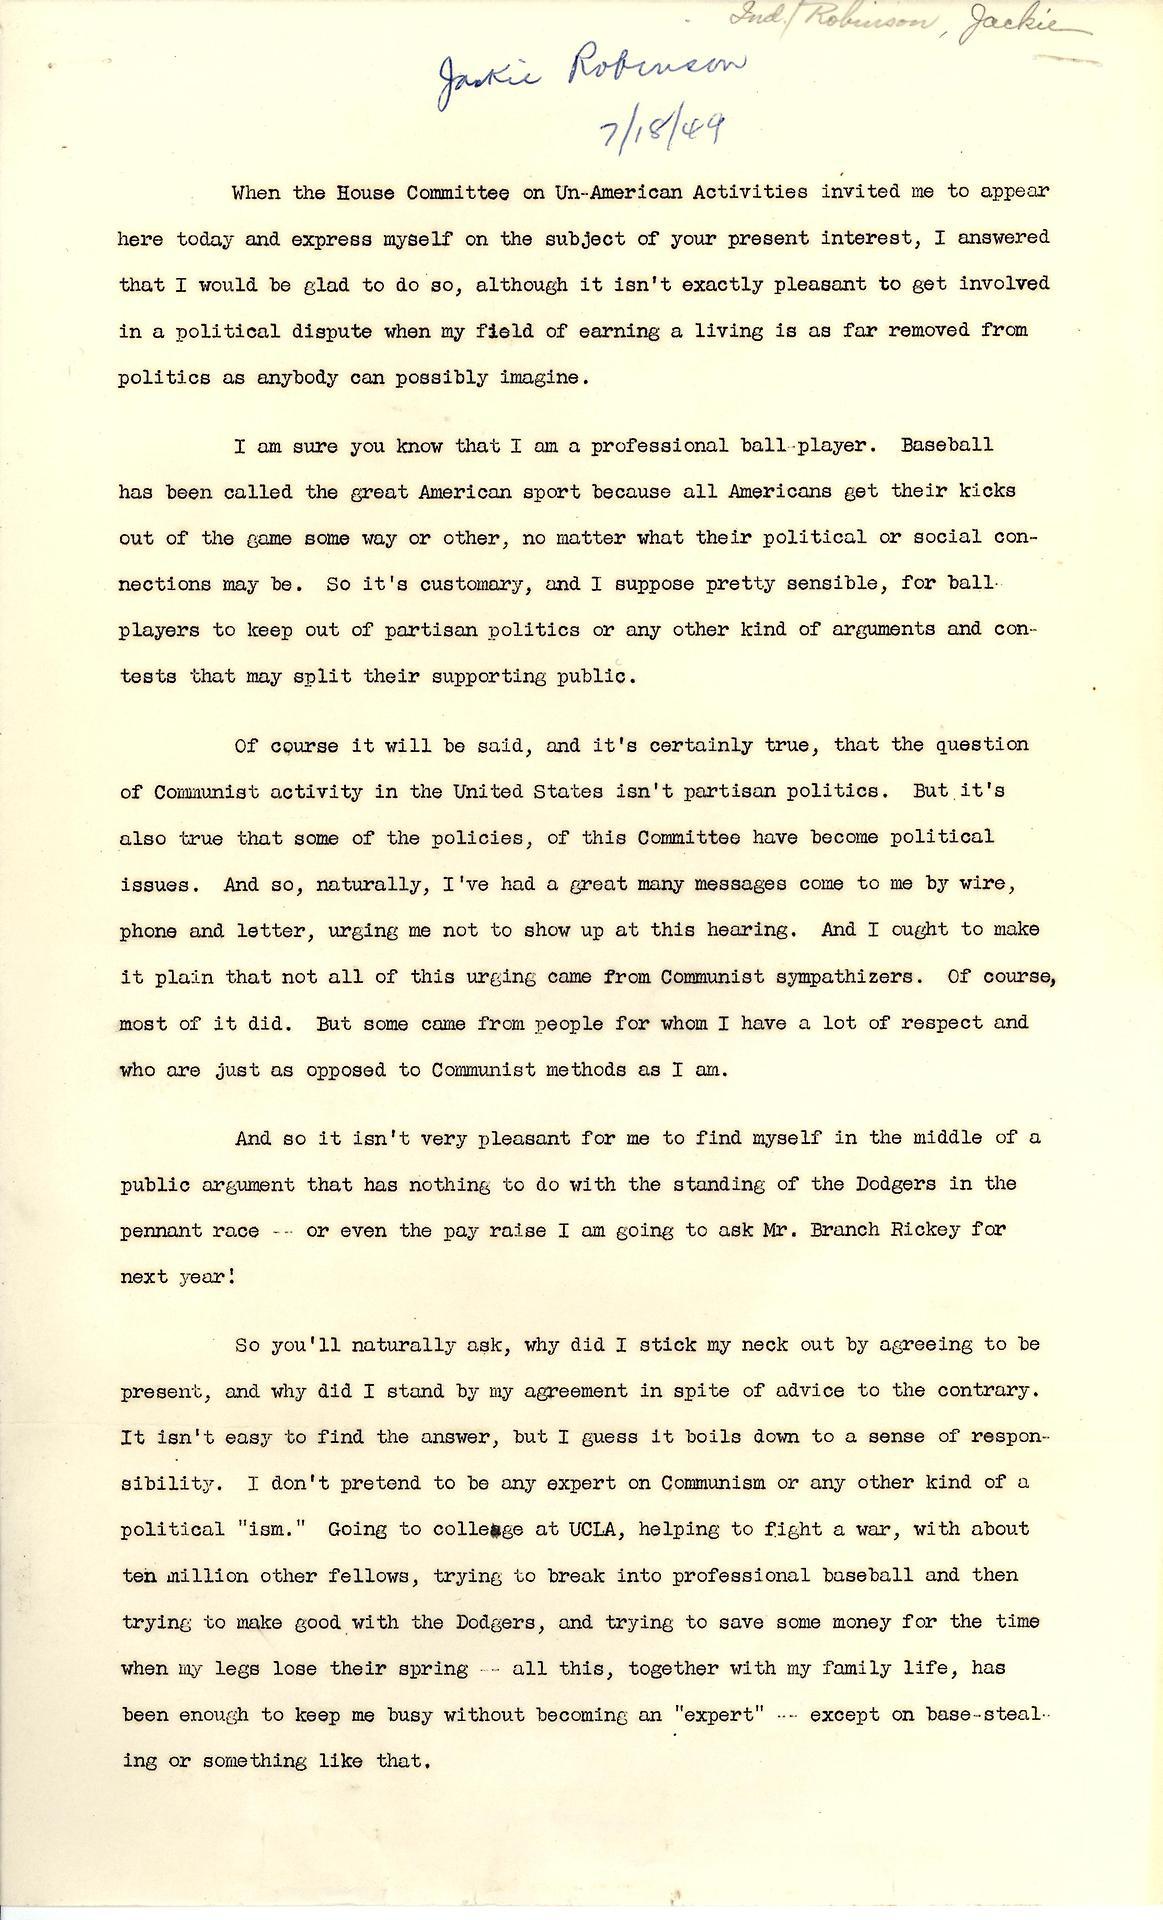 Start Of Jackie Robinson S House Committee On Un American Activities Speech